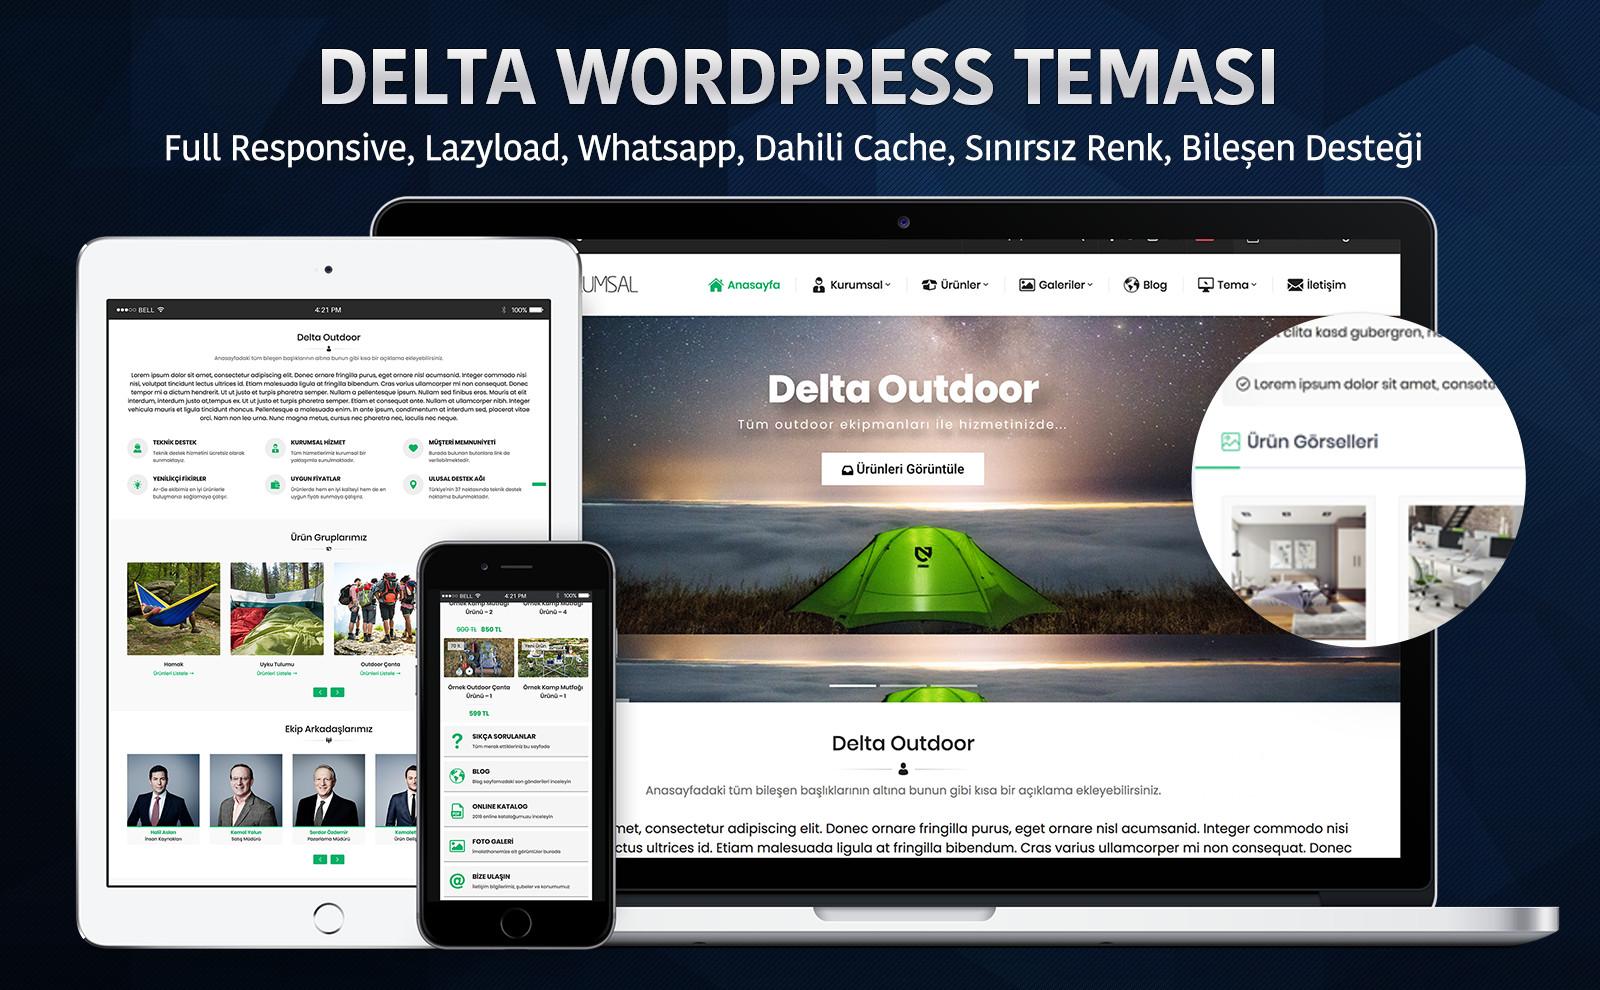 Safir Delta WordPress Teması